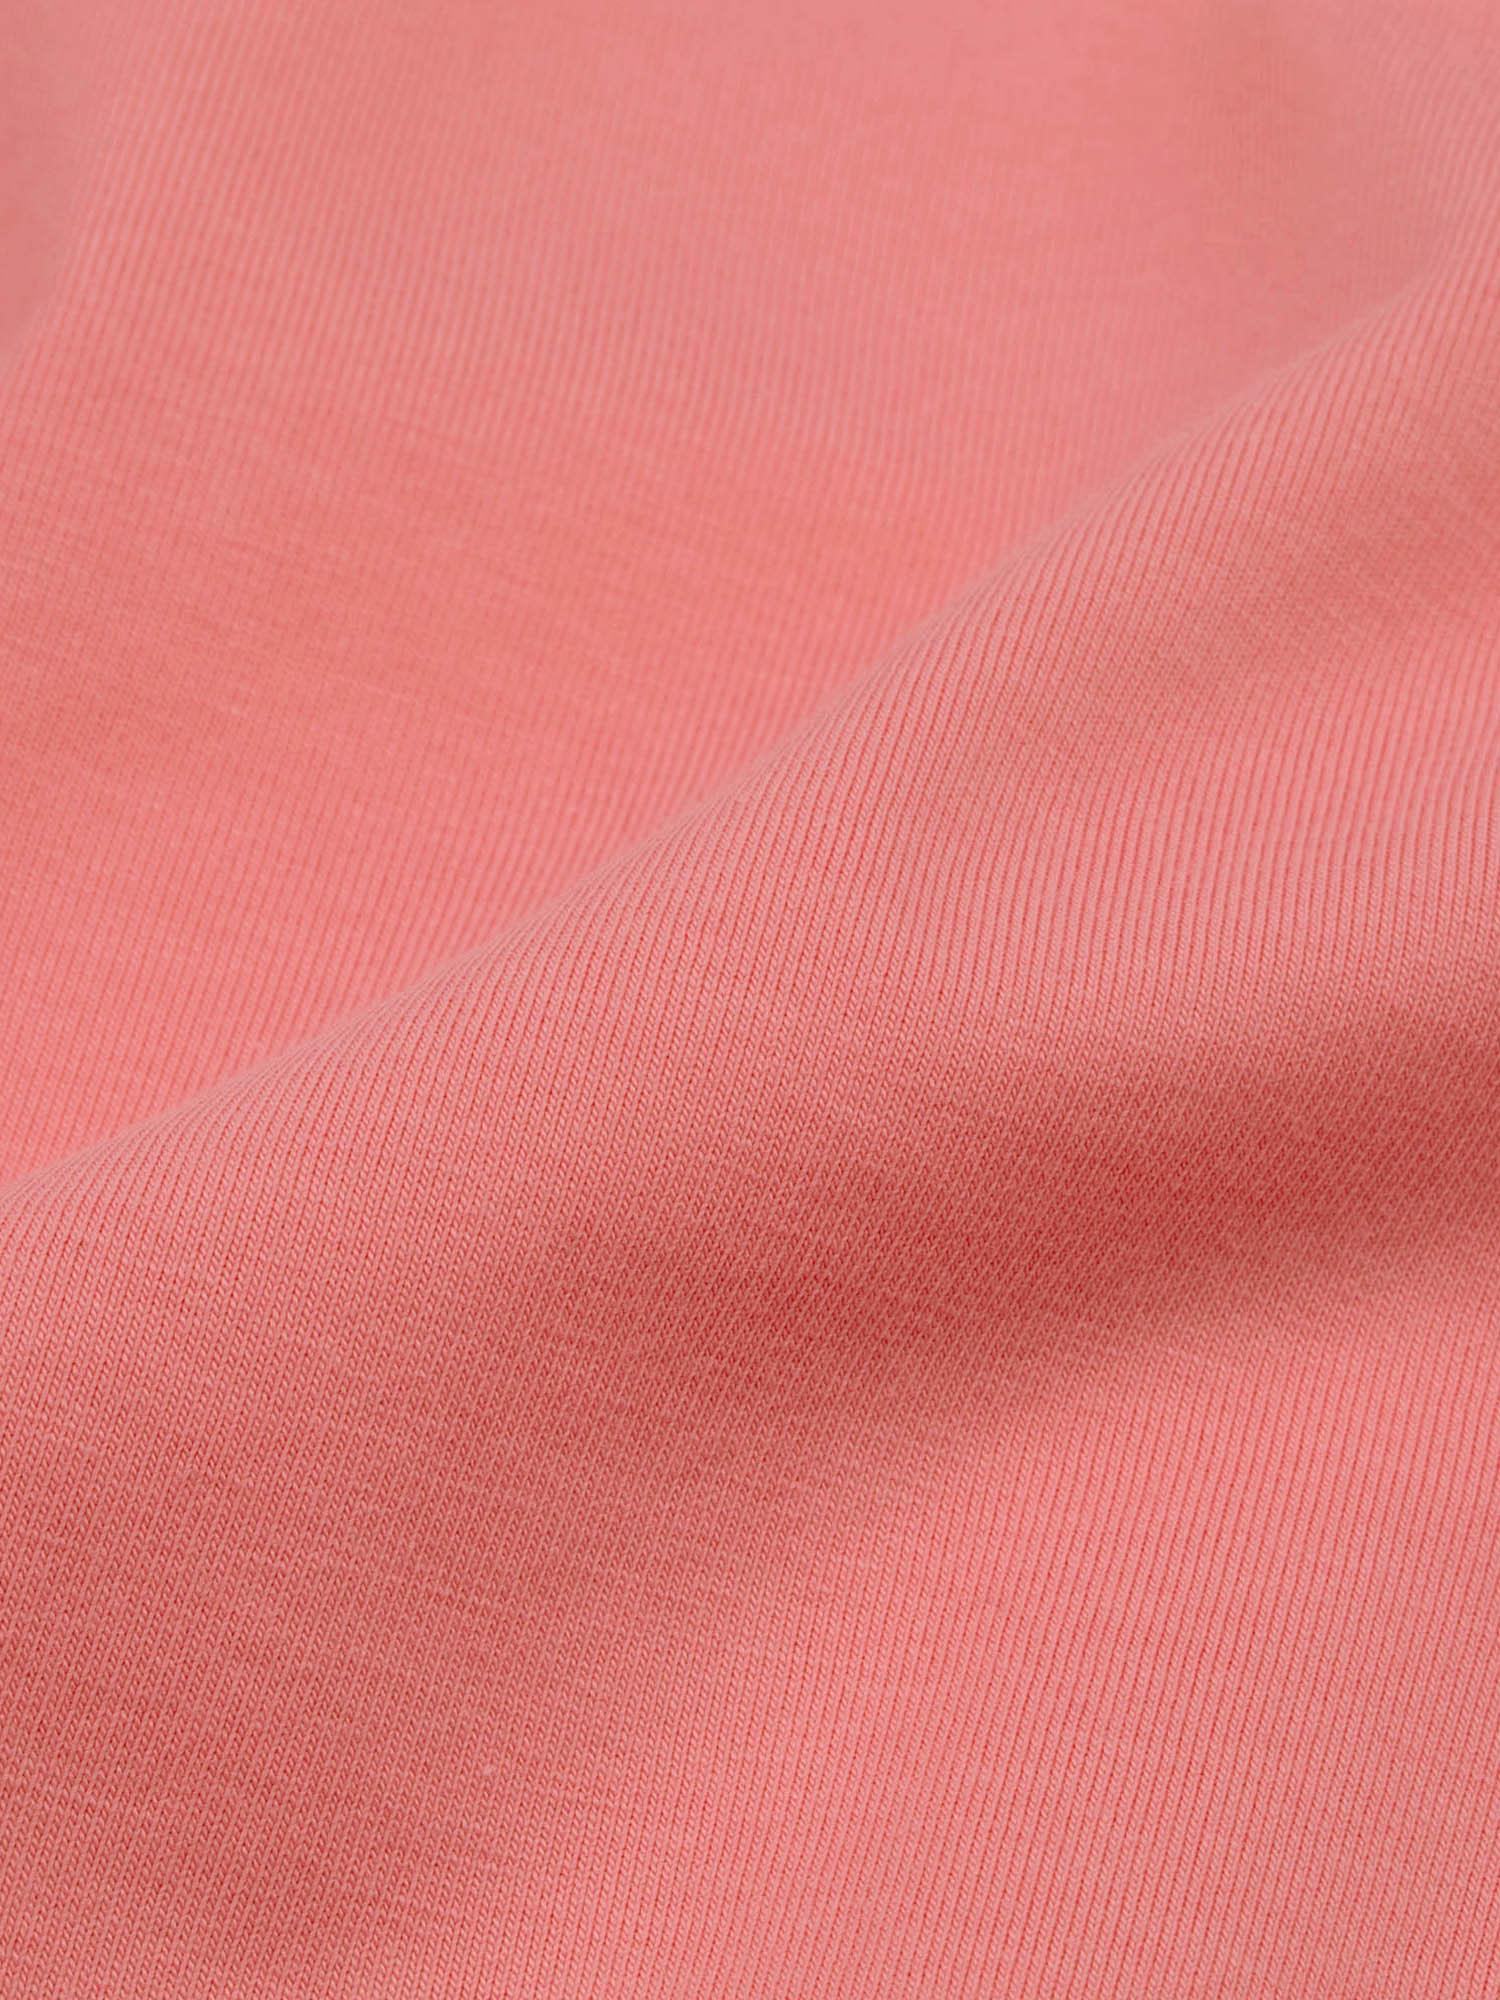 YDENCE YDENCE - T-shirt bree perzik